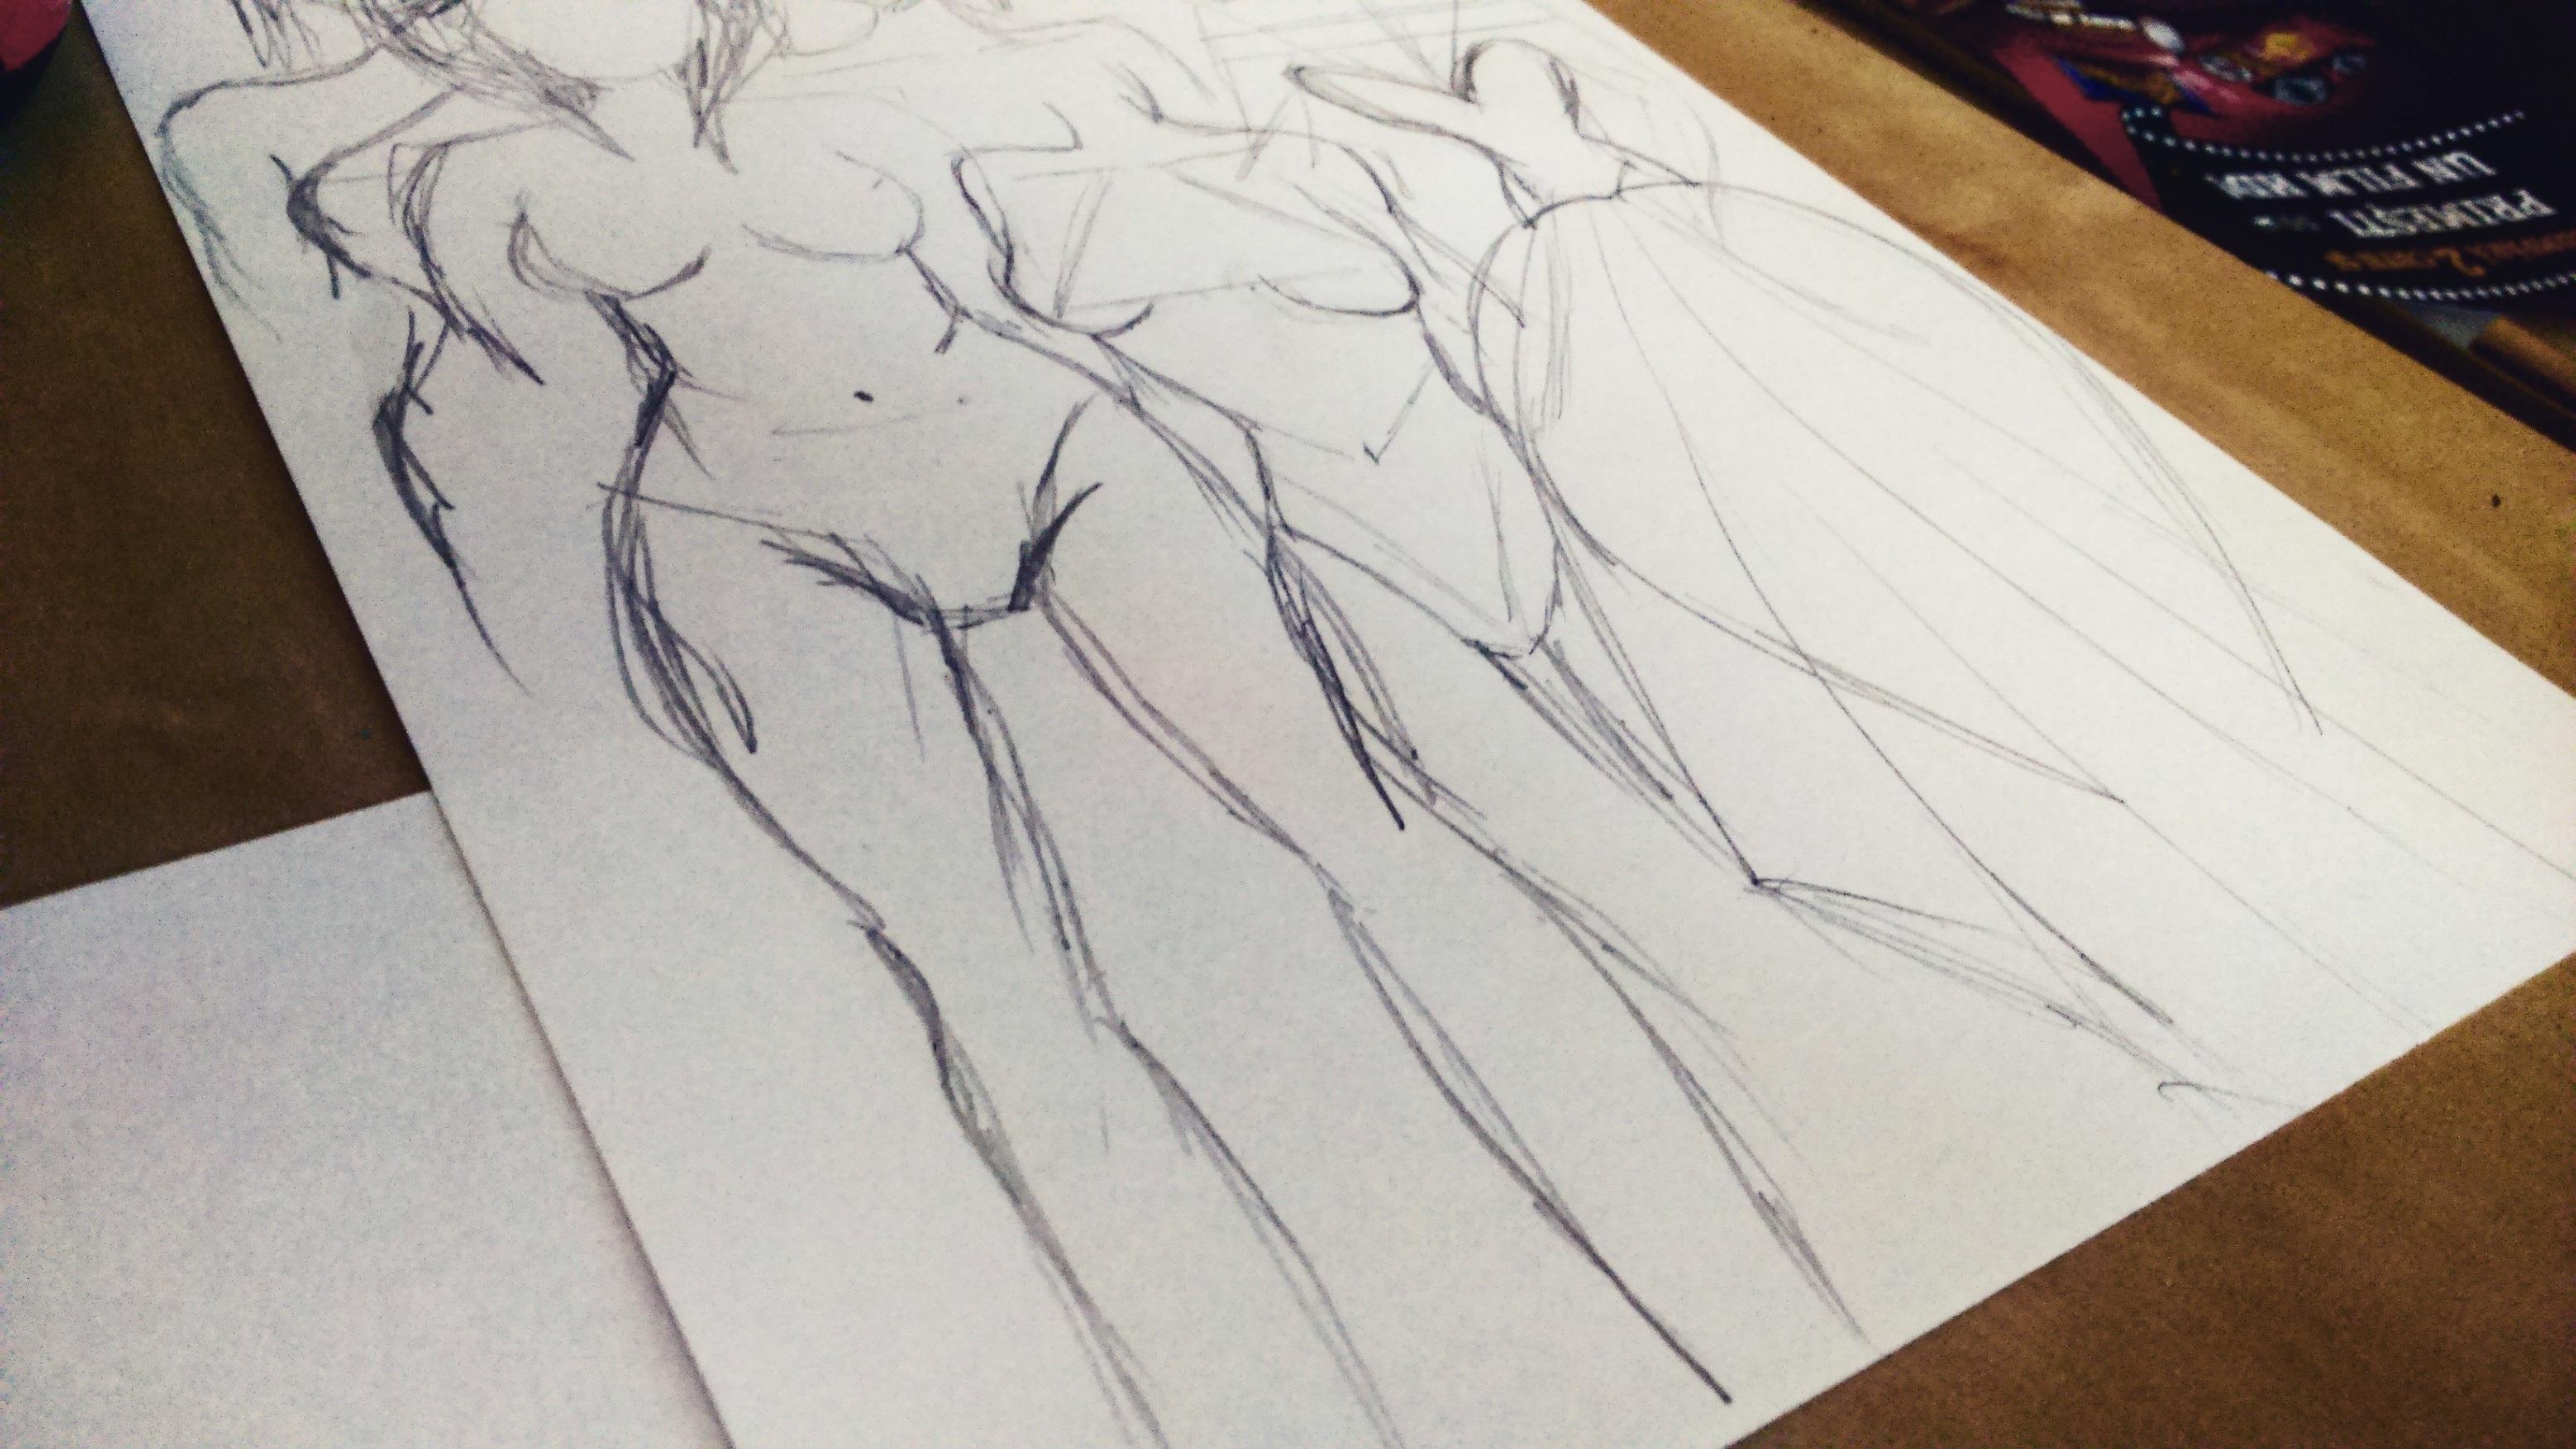 Pencil creative wing people girl woman cute artwork create sketch drawing creativity happy women body draw